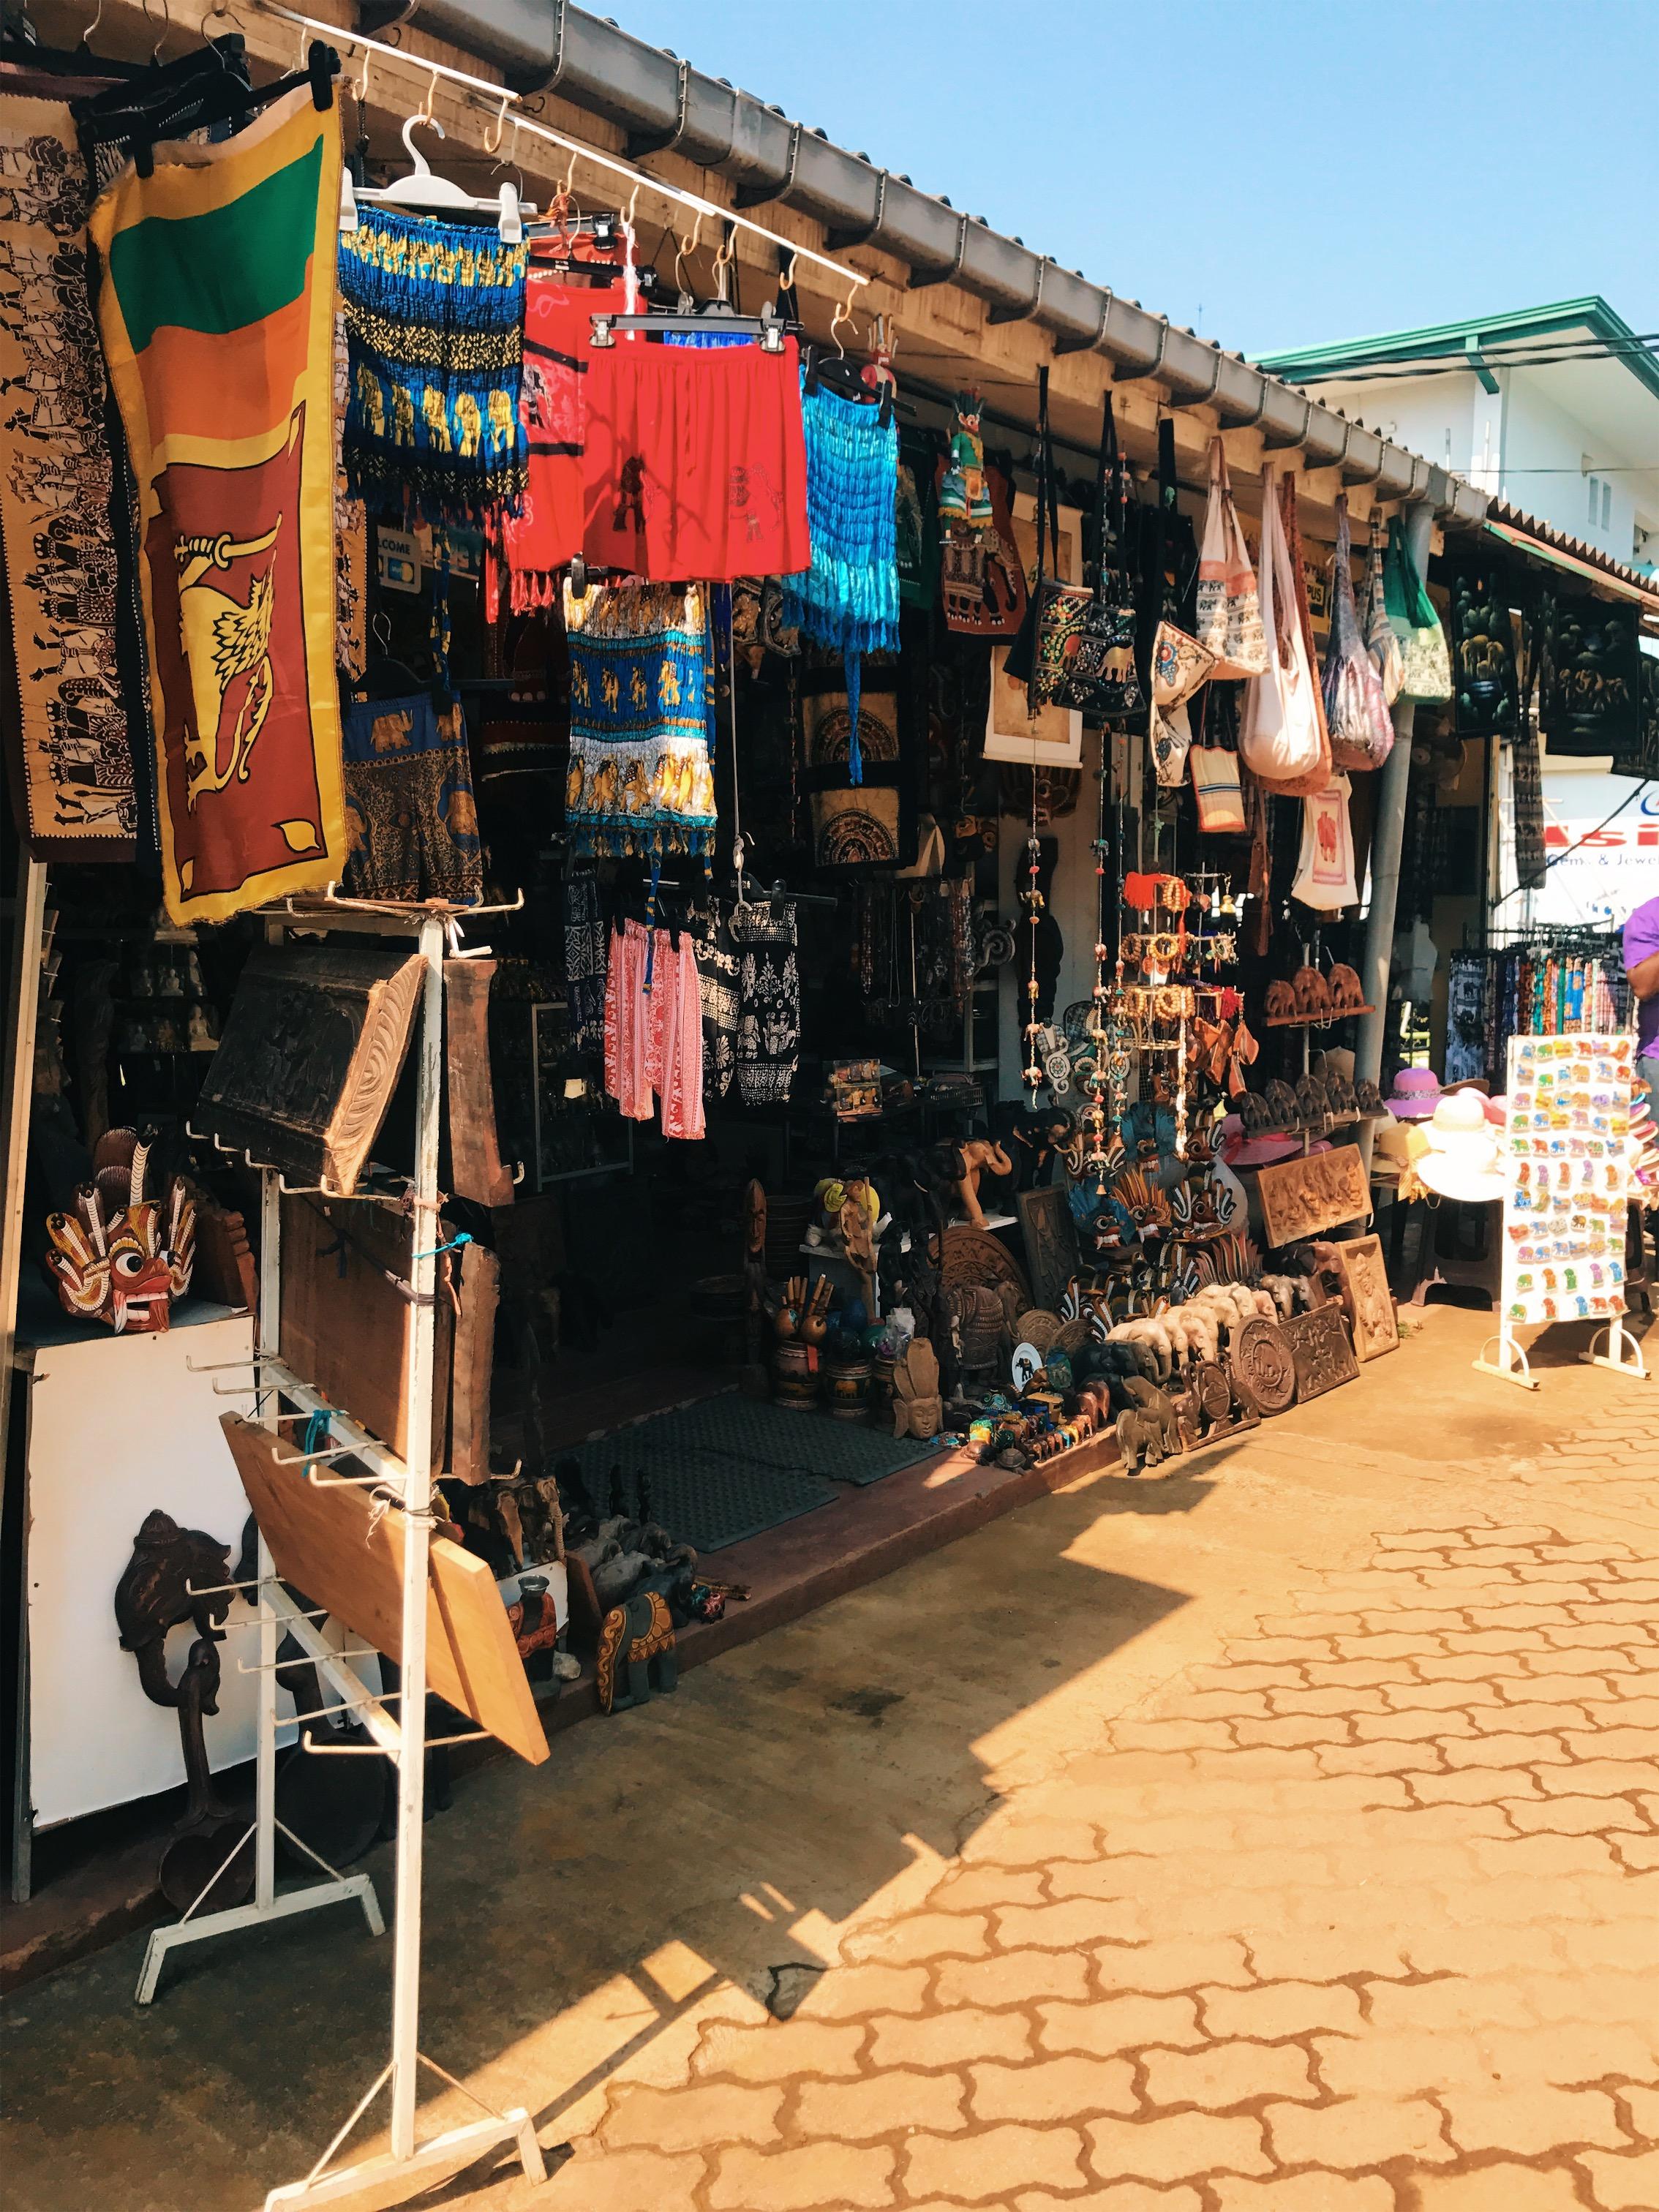 Rambukana Street Market